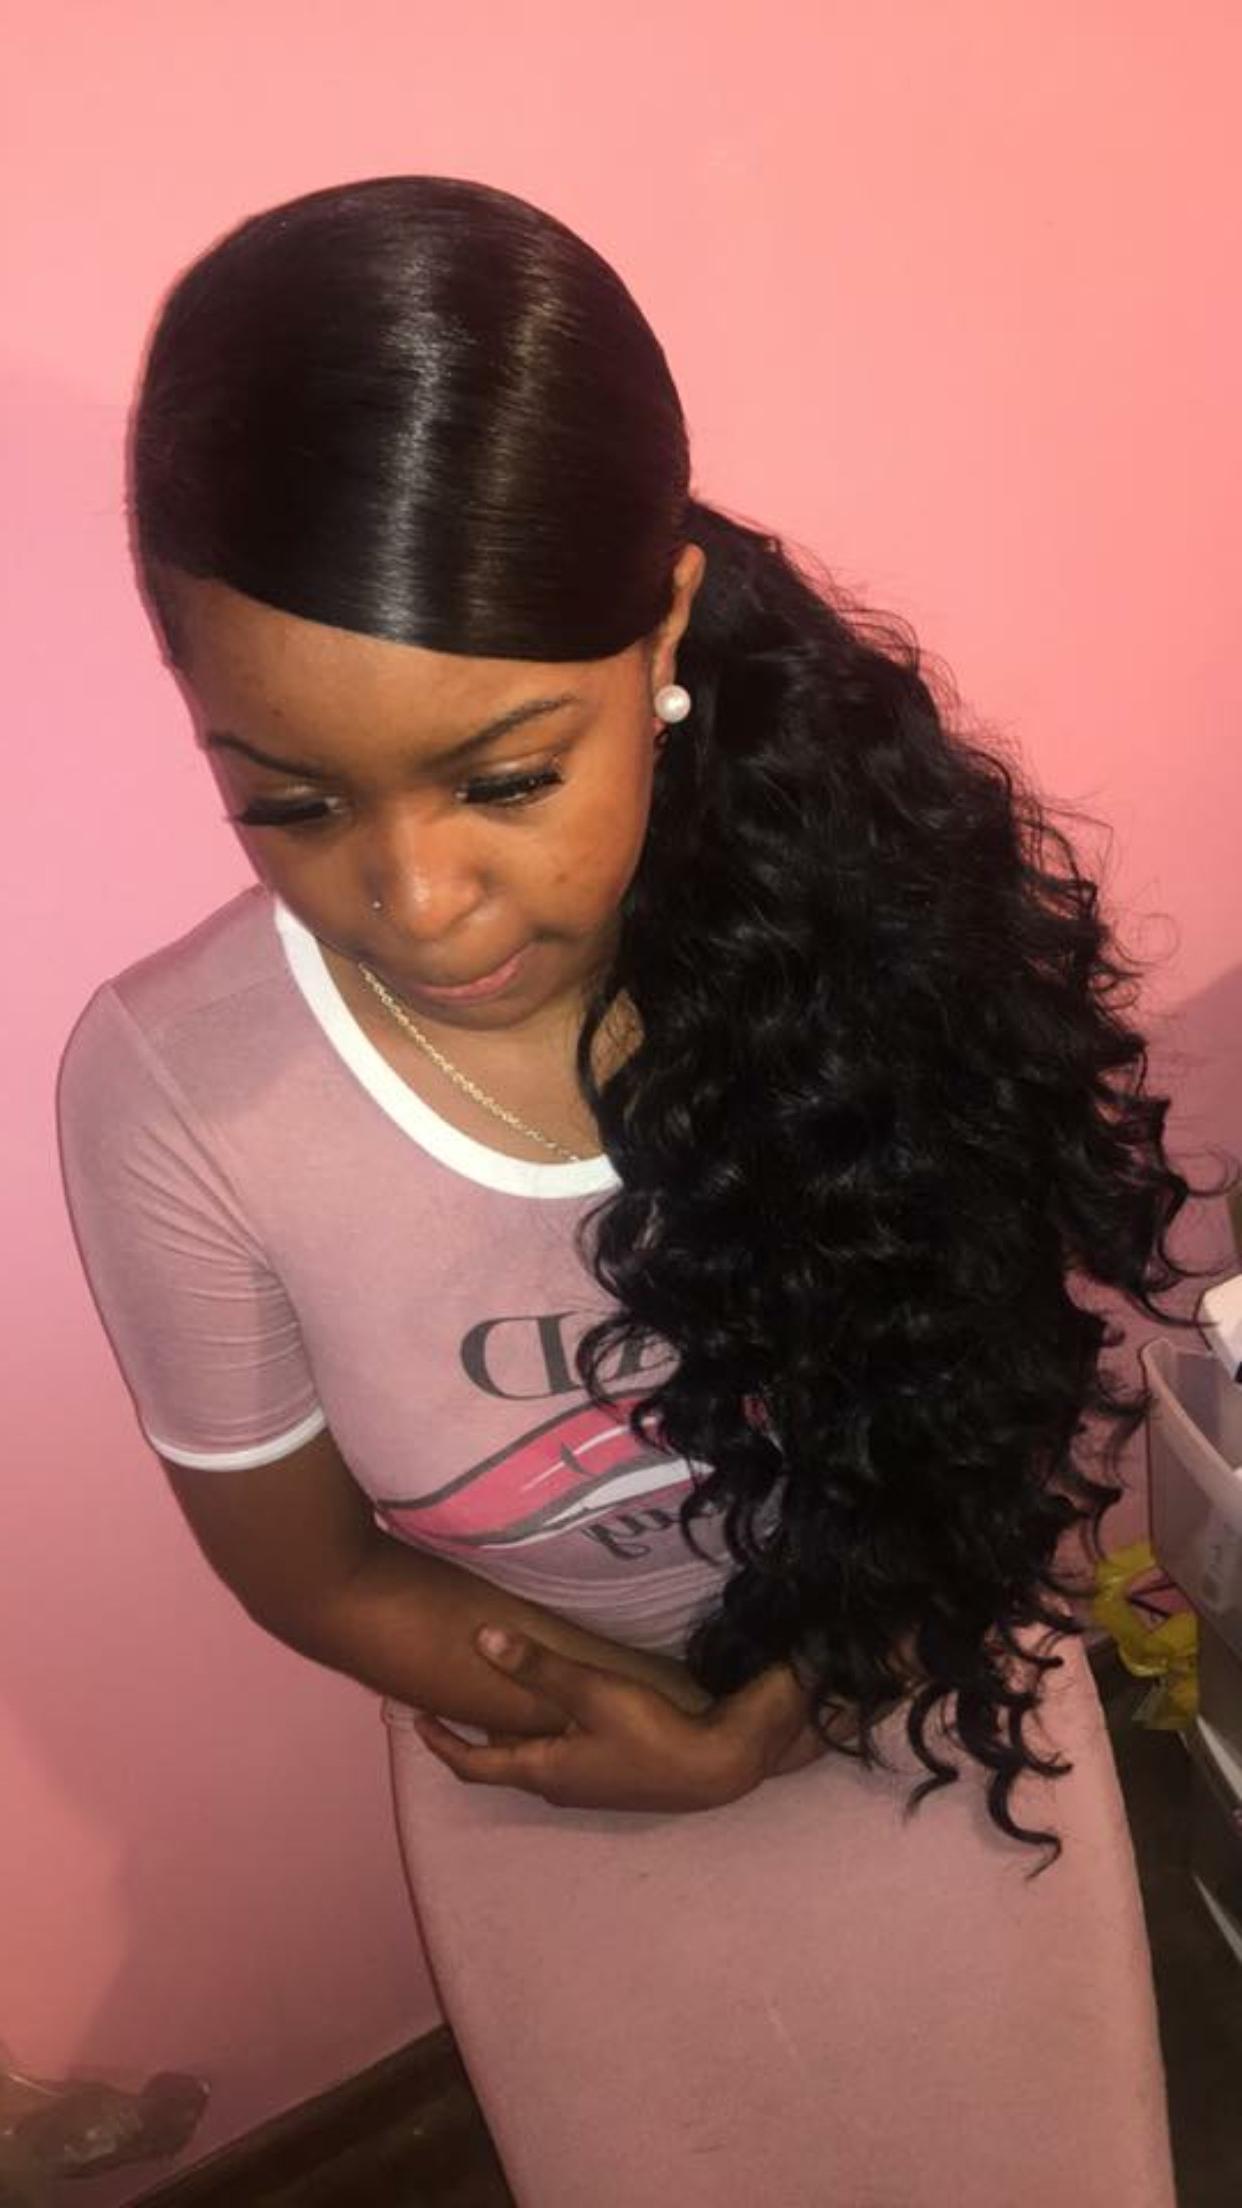 New Short Hairstyles For Black Girls – Uternity with regard to Short Hairstyles For Black Teenagers